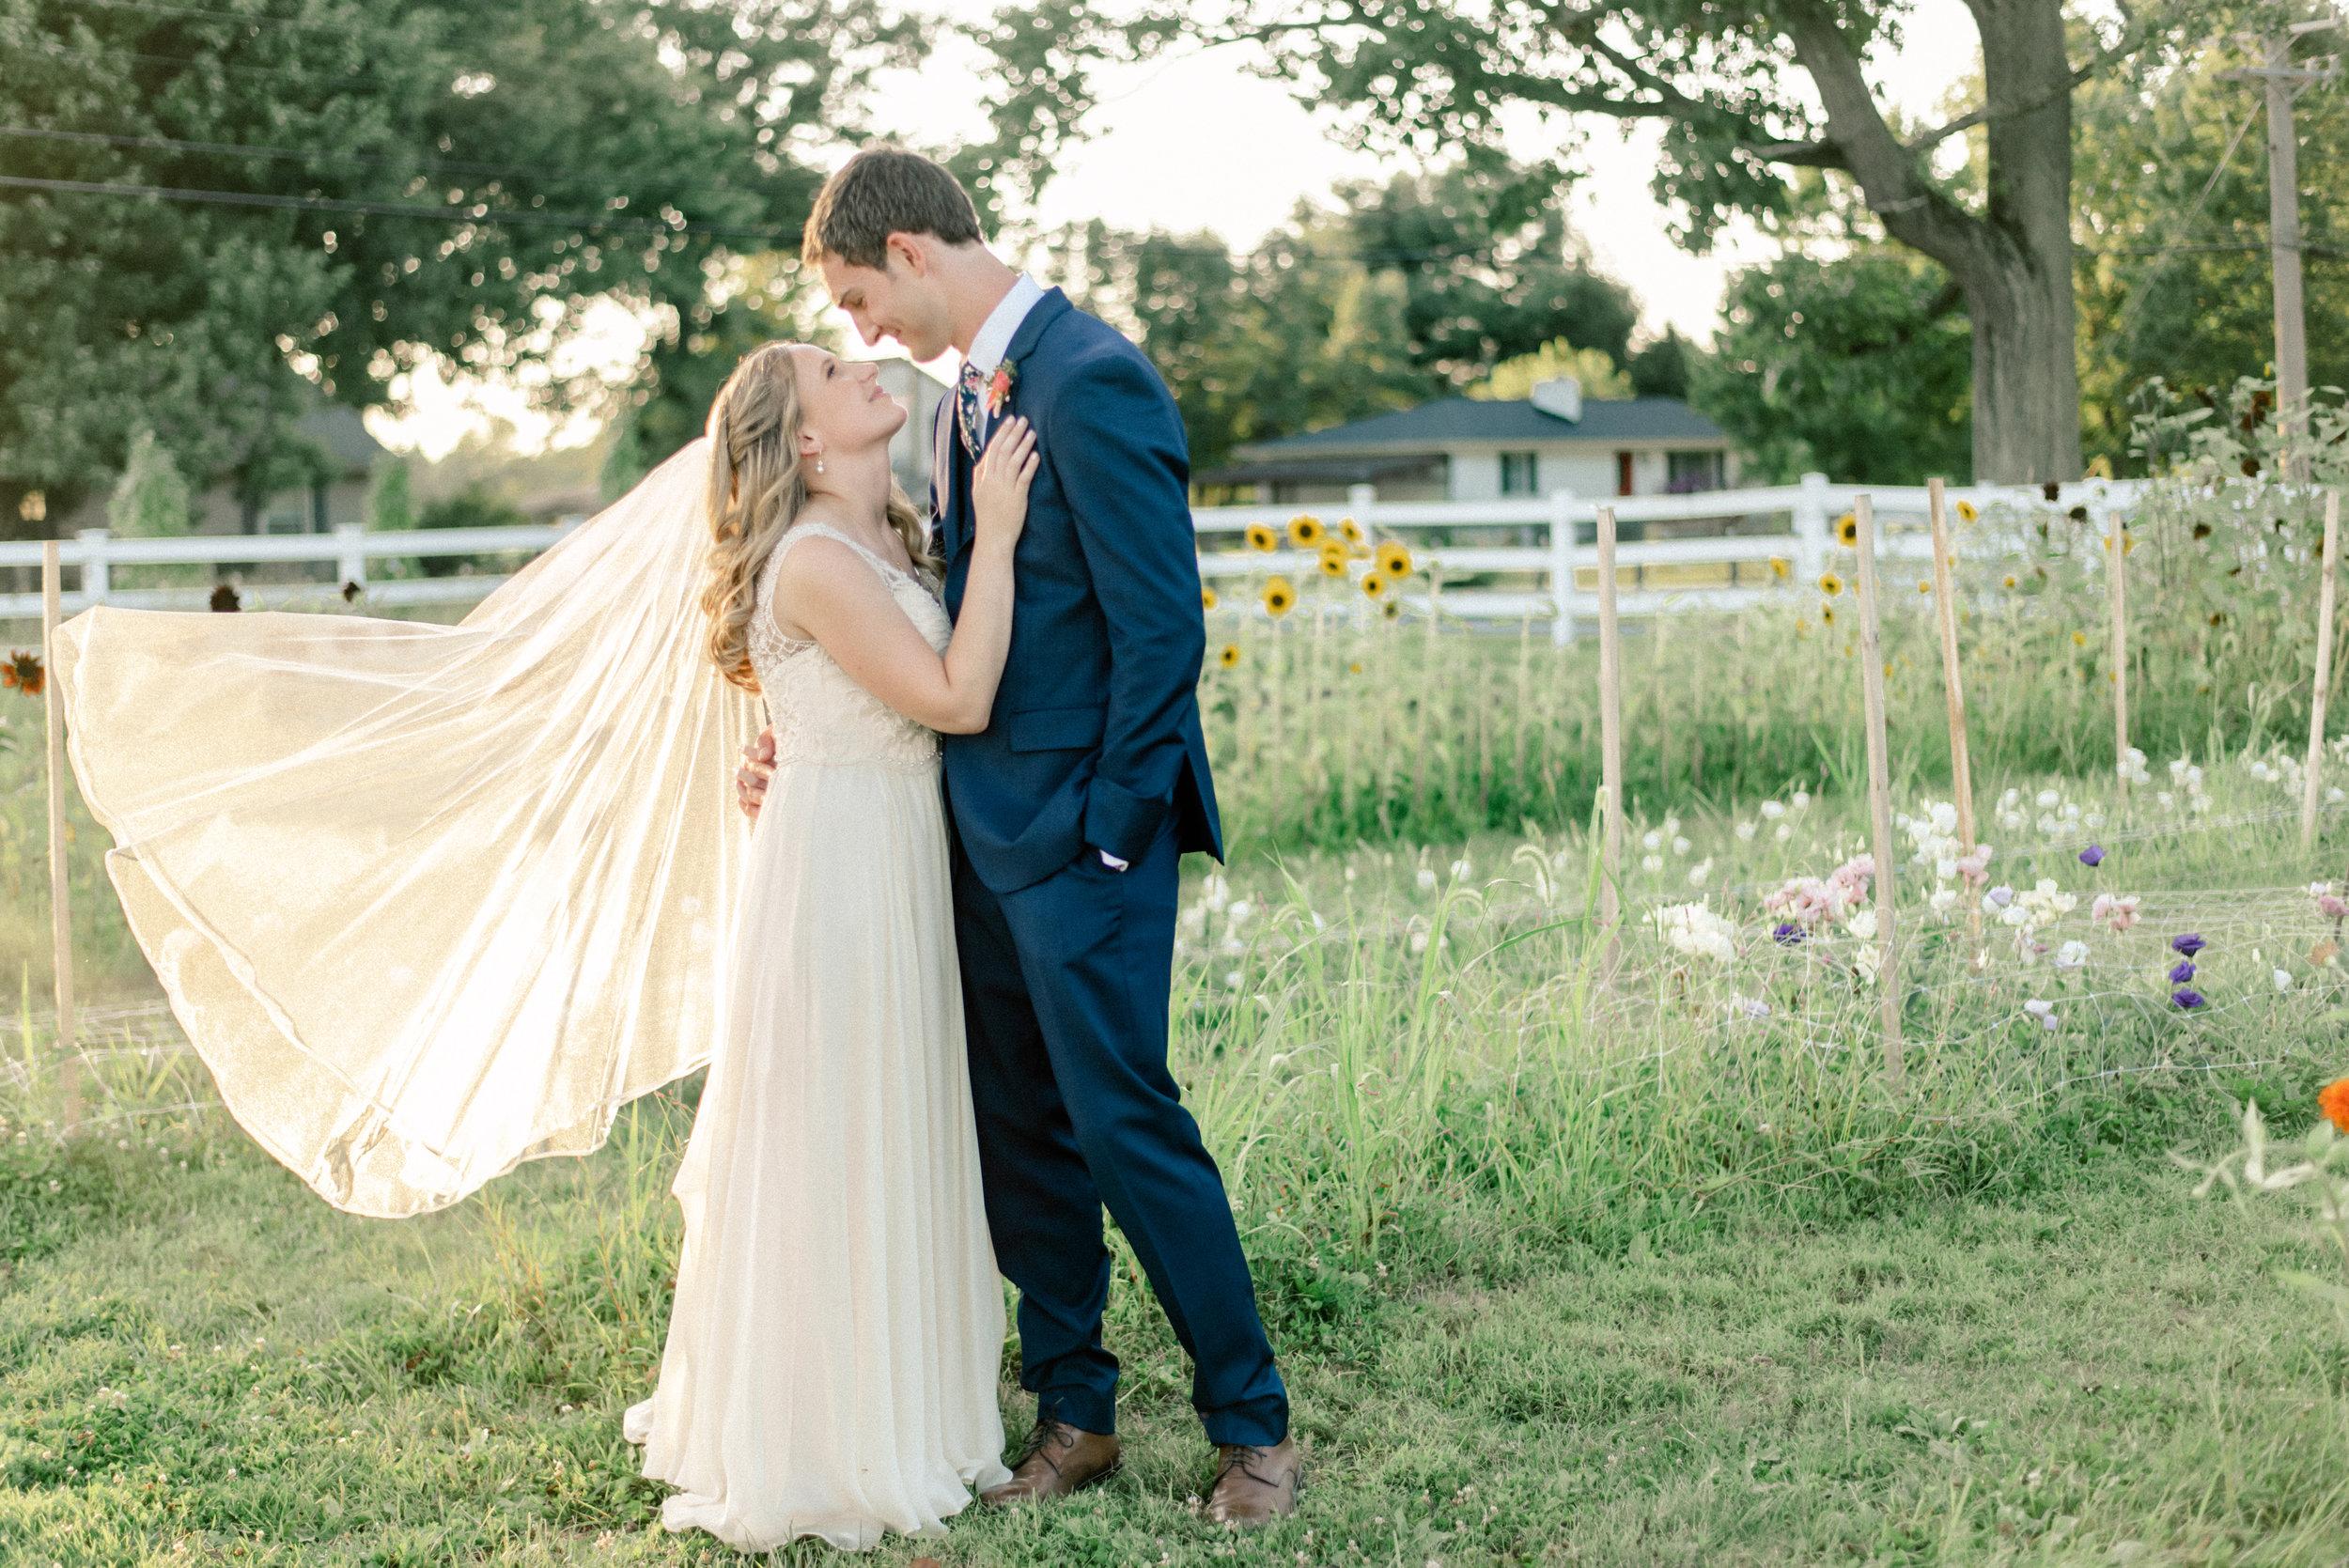 Brideandgroom-Anna+Dan_(25_of_50).jpg